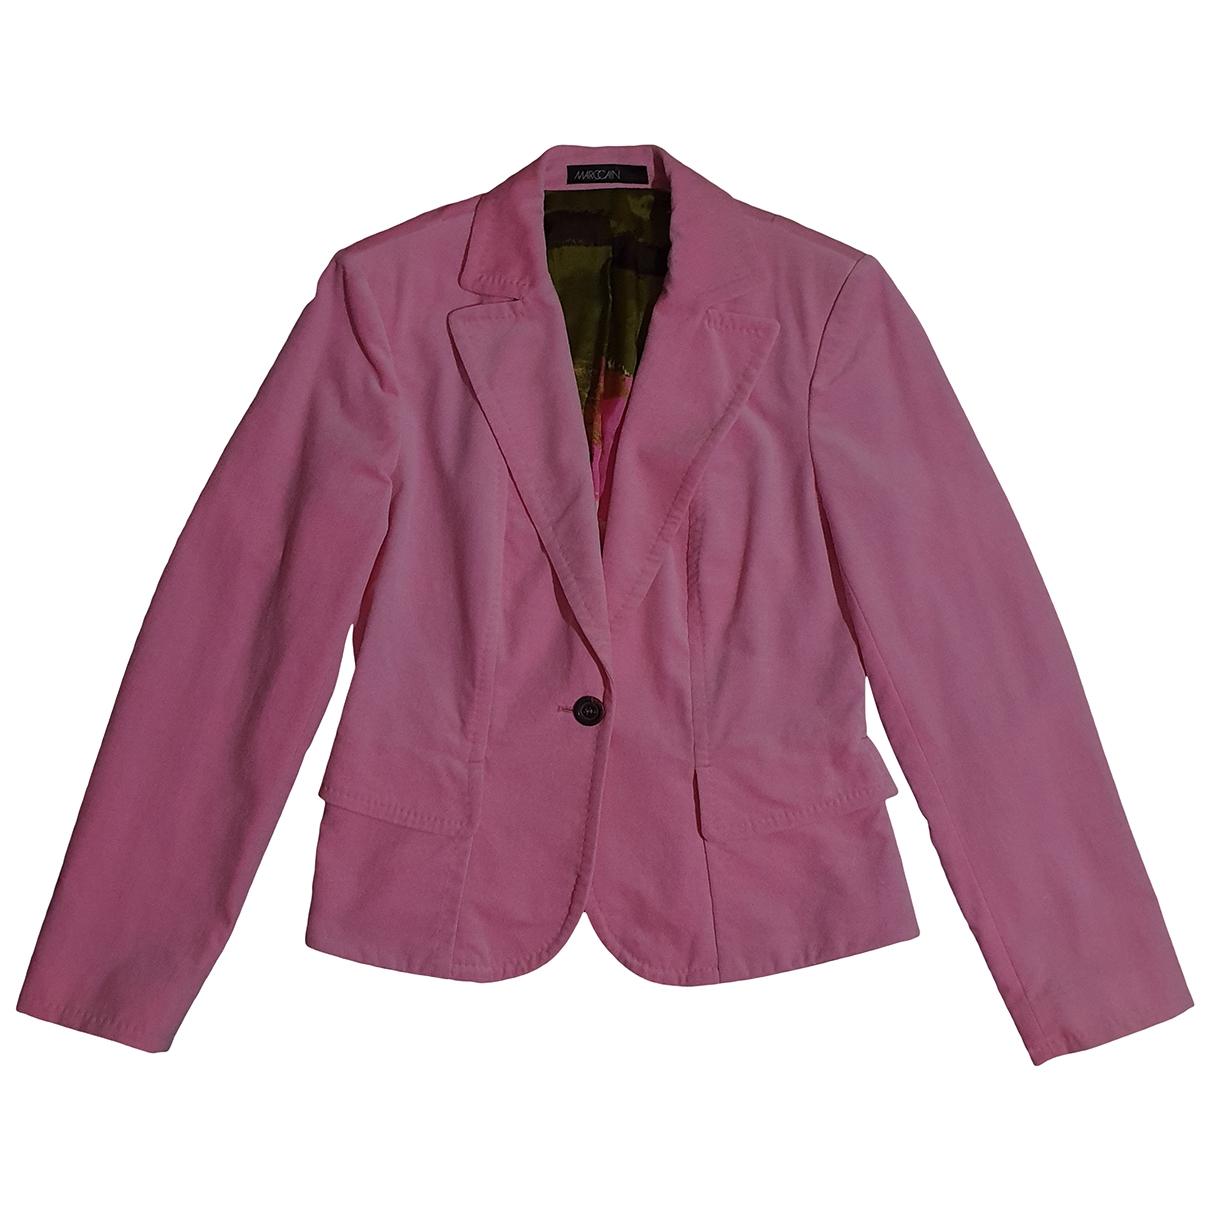 Marc Cain \N Pink Cotton jacket for Women M International